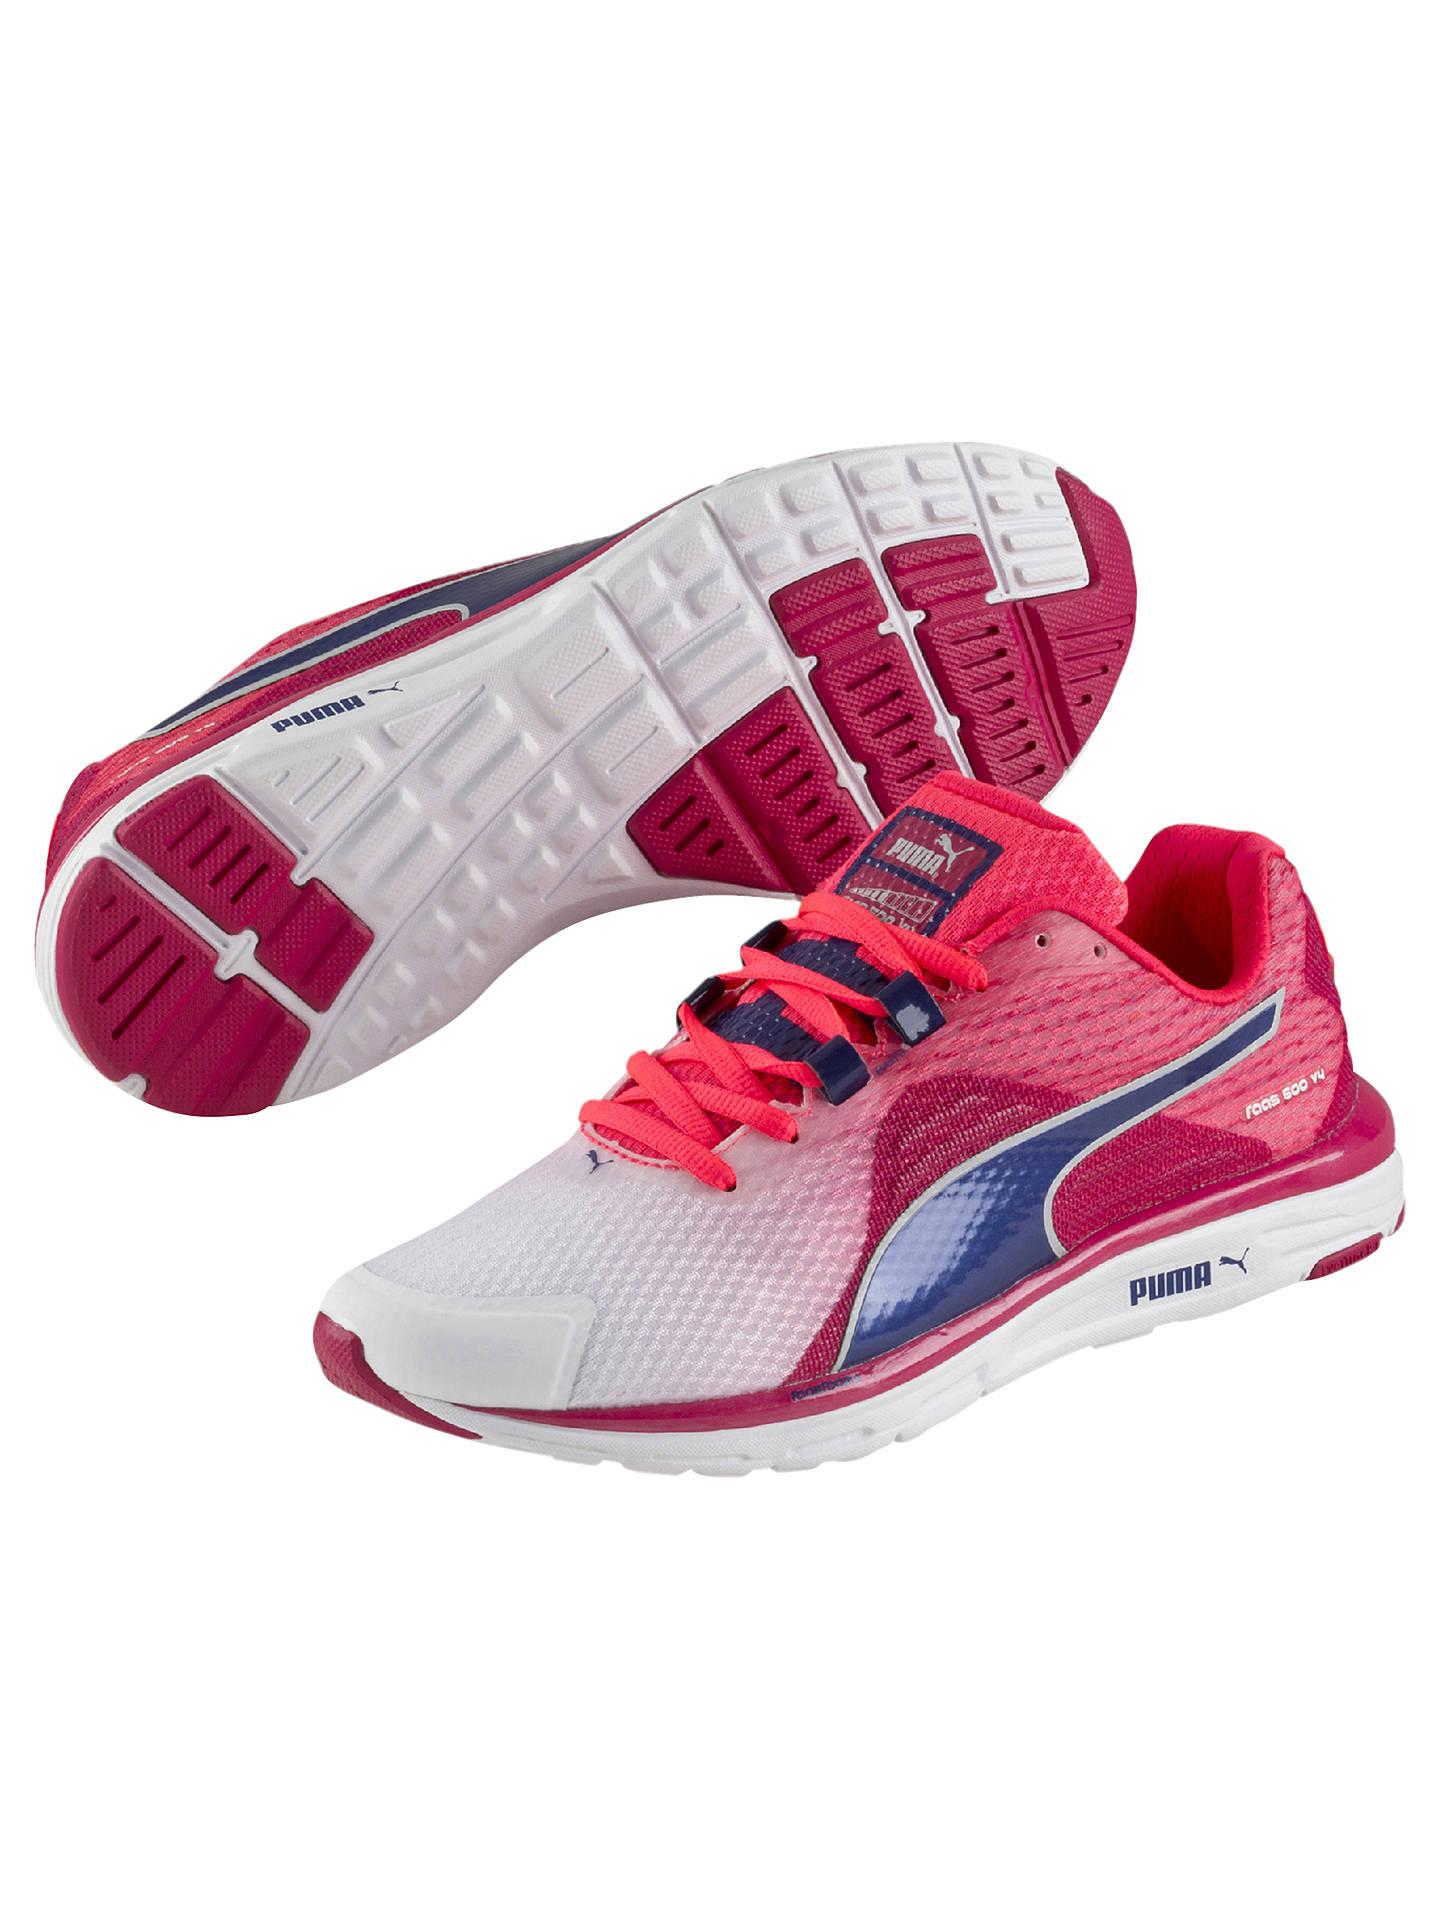 bdebe5828575 ... BuyPuma FAAS 500 V4 Women s Running Shoes